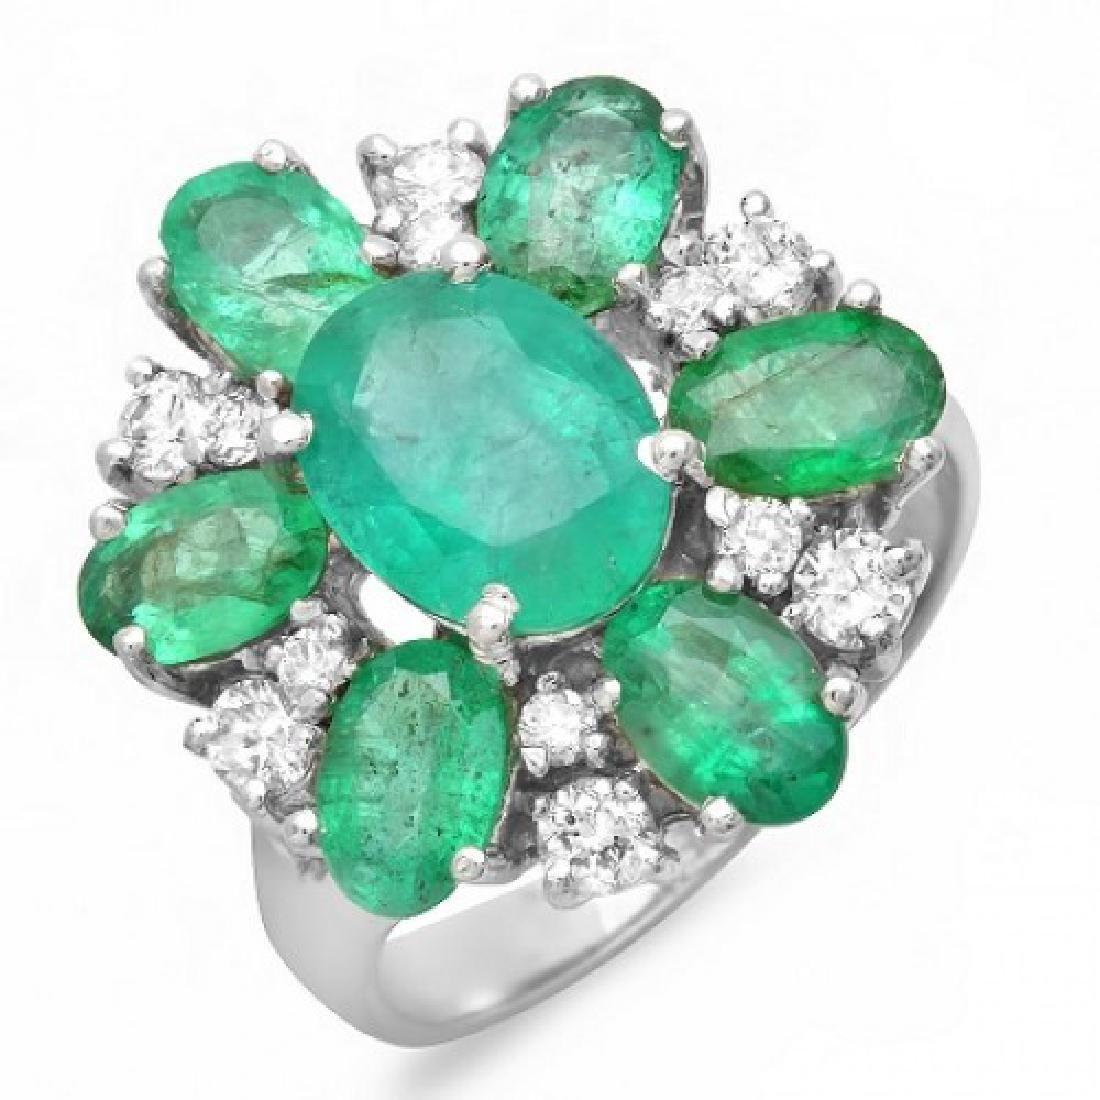 4.36 Carat Natural Emerald 18K Solid White Gold Diamond